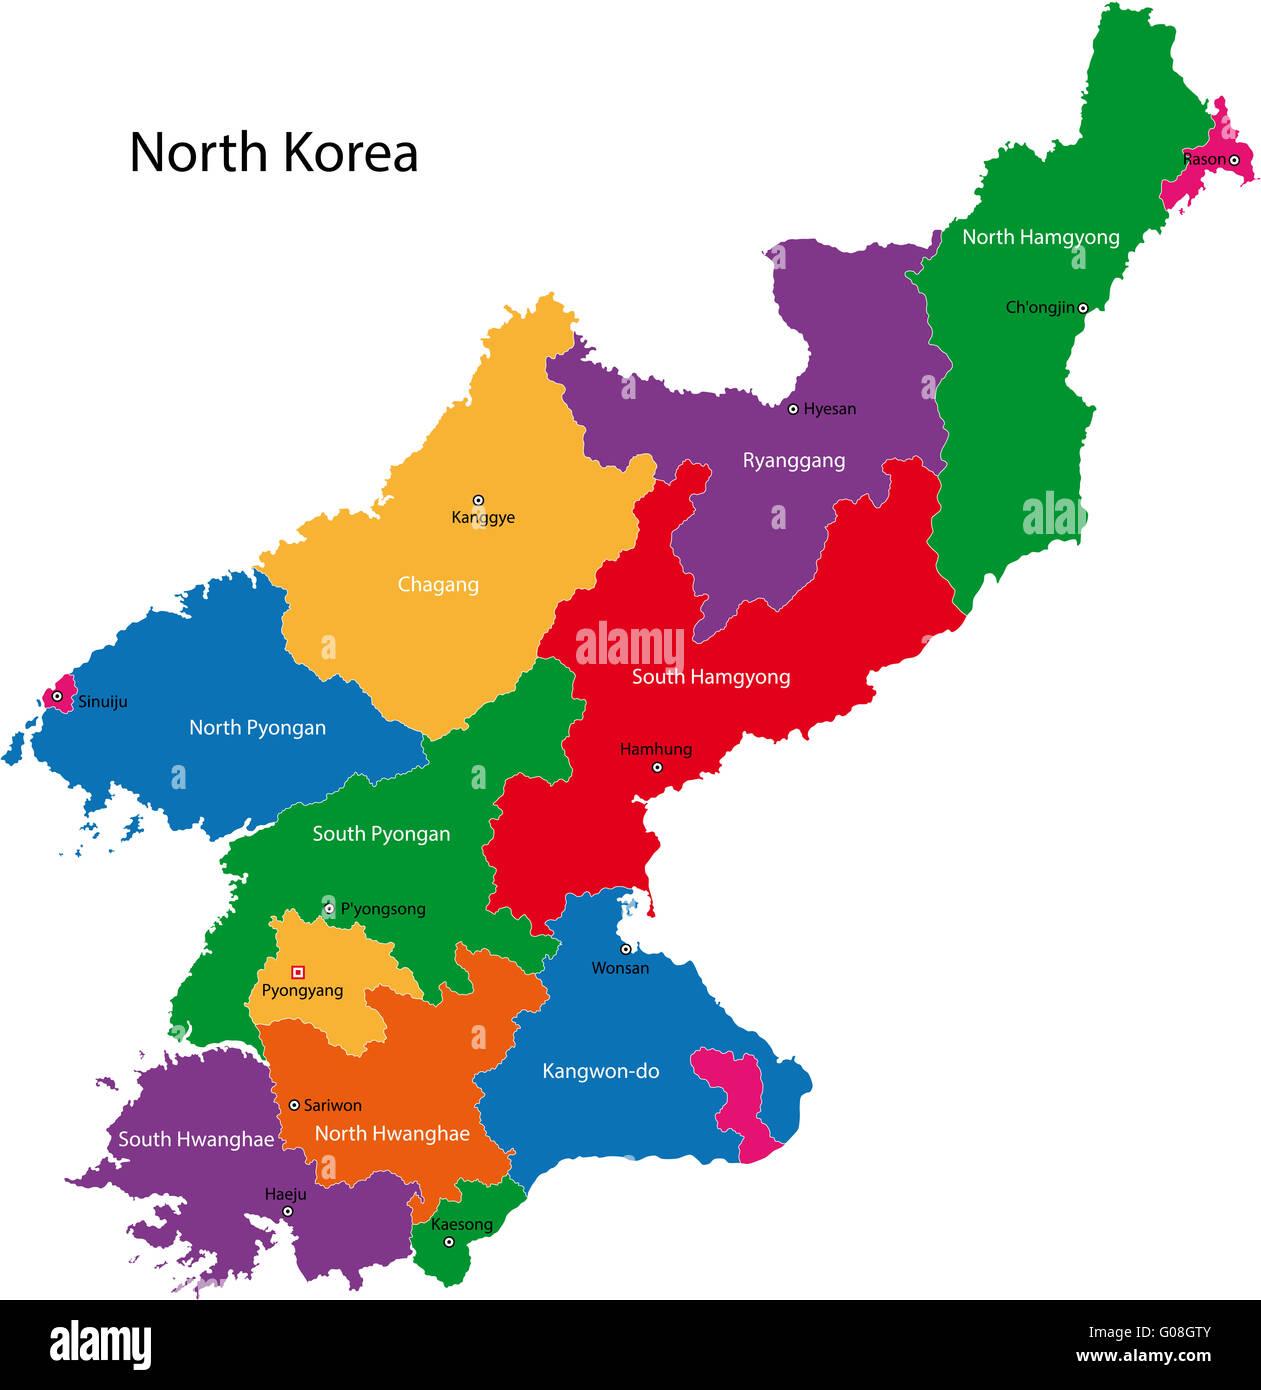 North Korea Map Stock Photo Royalty Free Image Alamy - North korea map